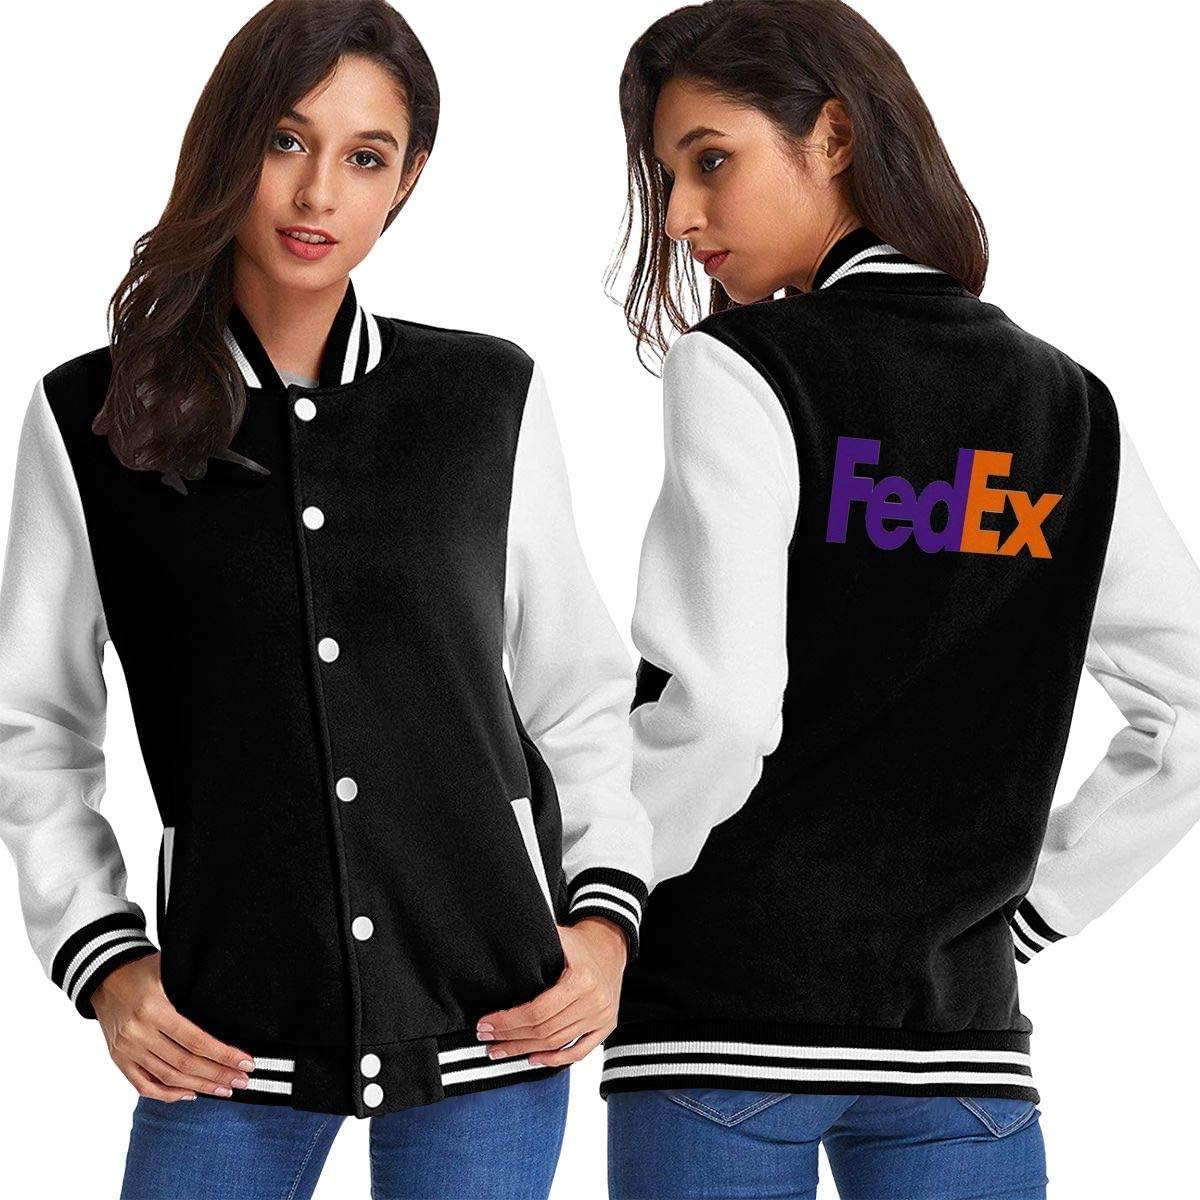 Hxuedan Woman's FedEx Baseball Uniform